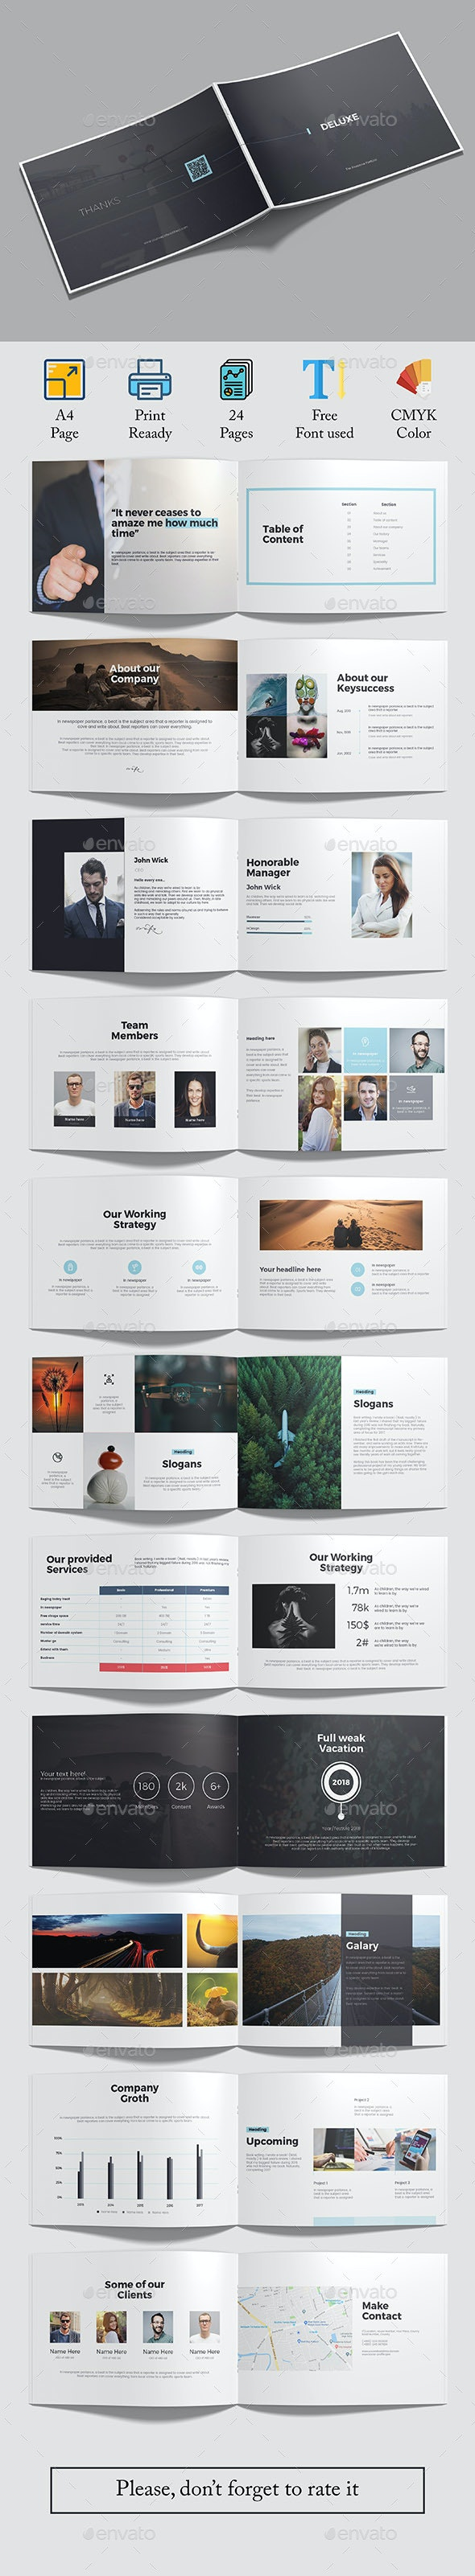 Deluxe A5 Landscape Brochure - Corporate Brochures